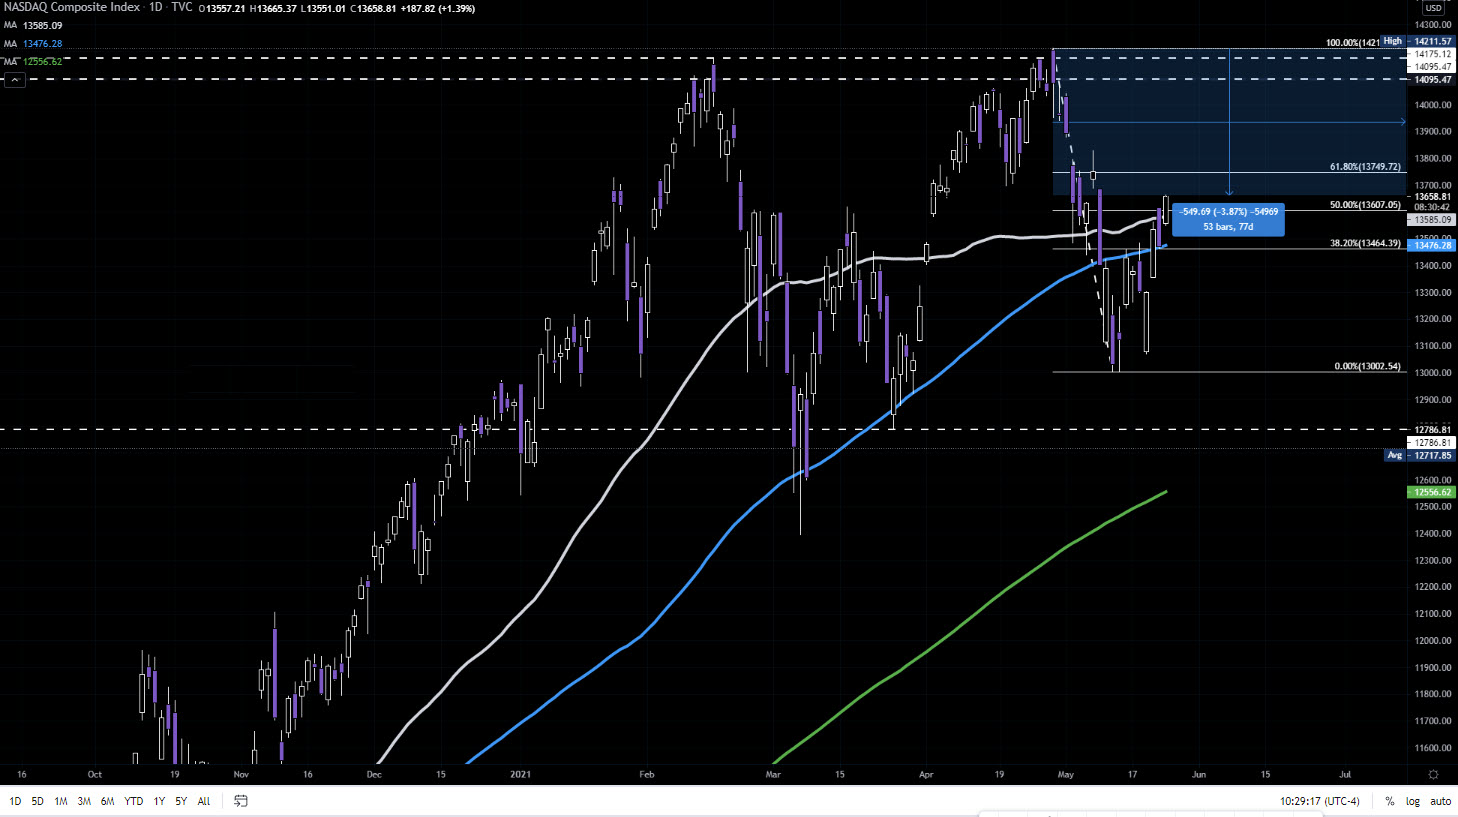 NASDAQ index on the daily chart